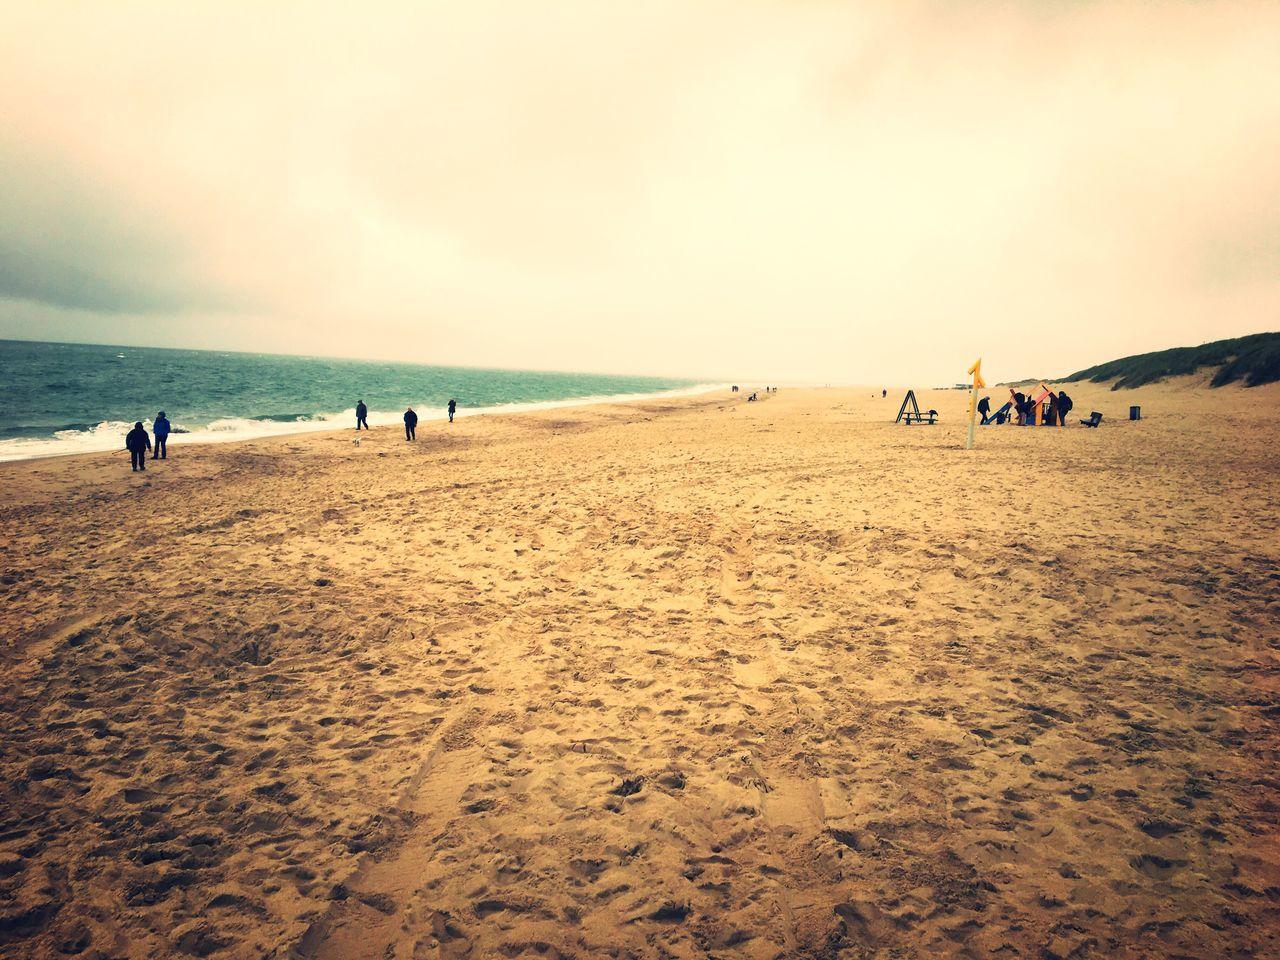 Beach Holidays Dunes Sand Dune